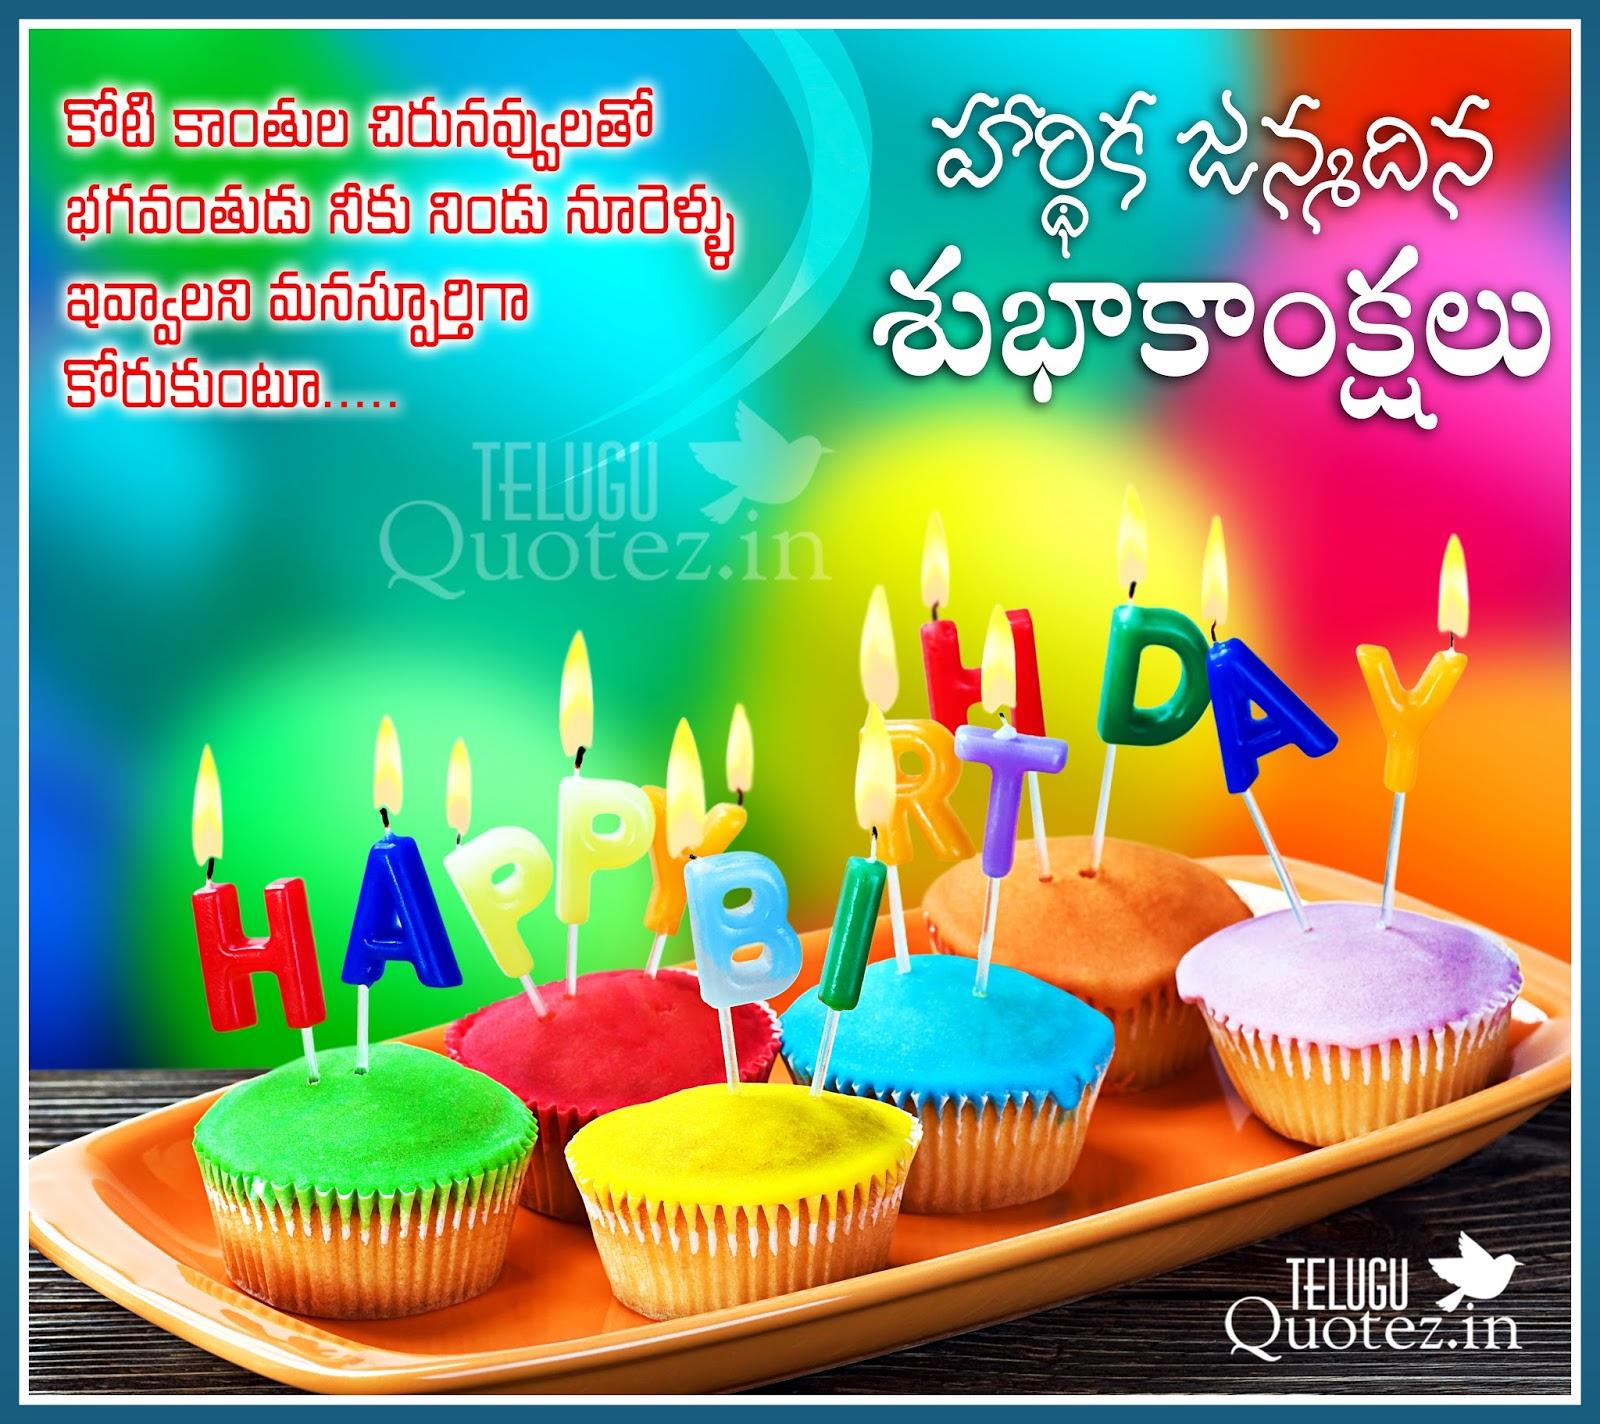 Pin By Prem Kumar On Sanny Pinterest Happy Birthday Quotes